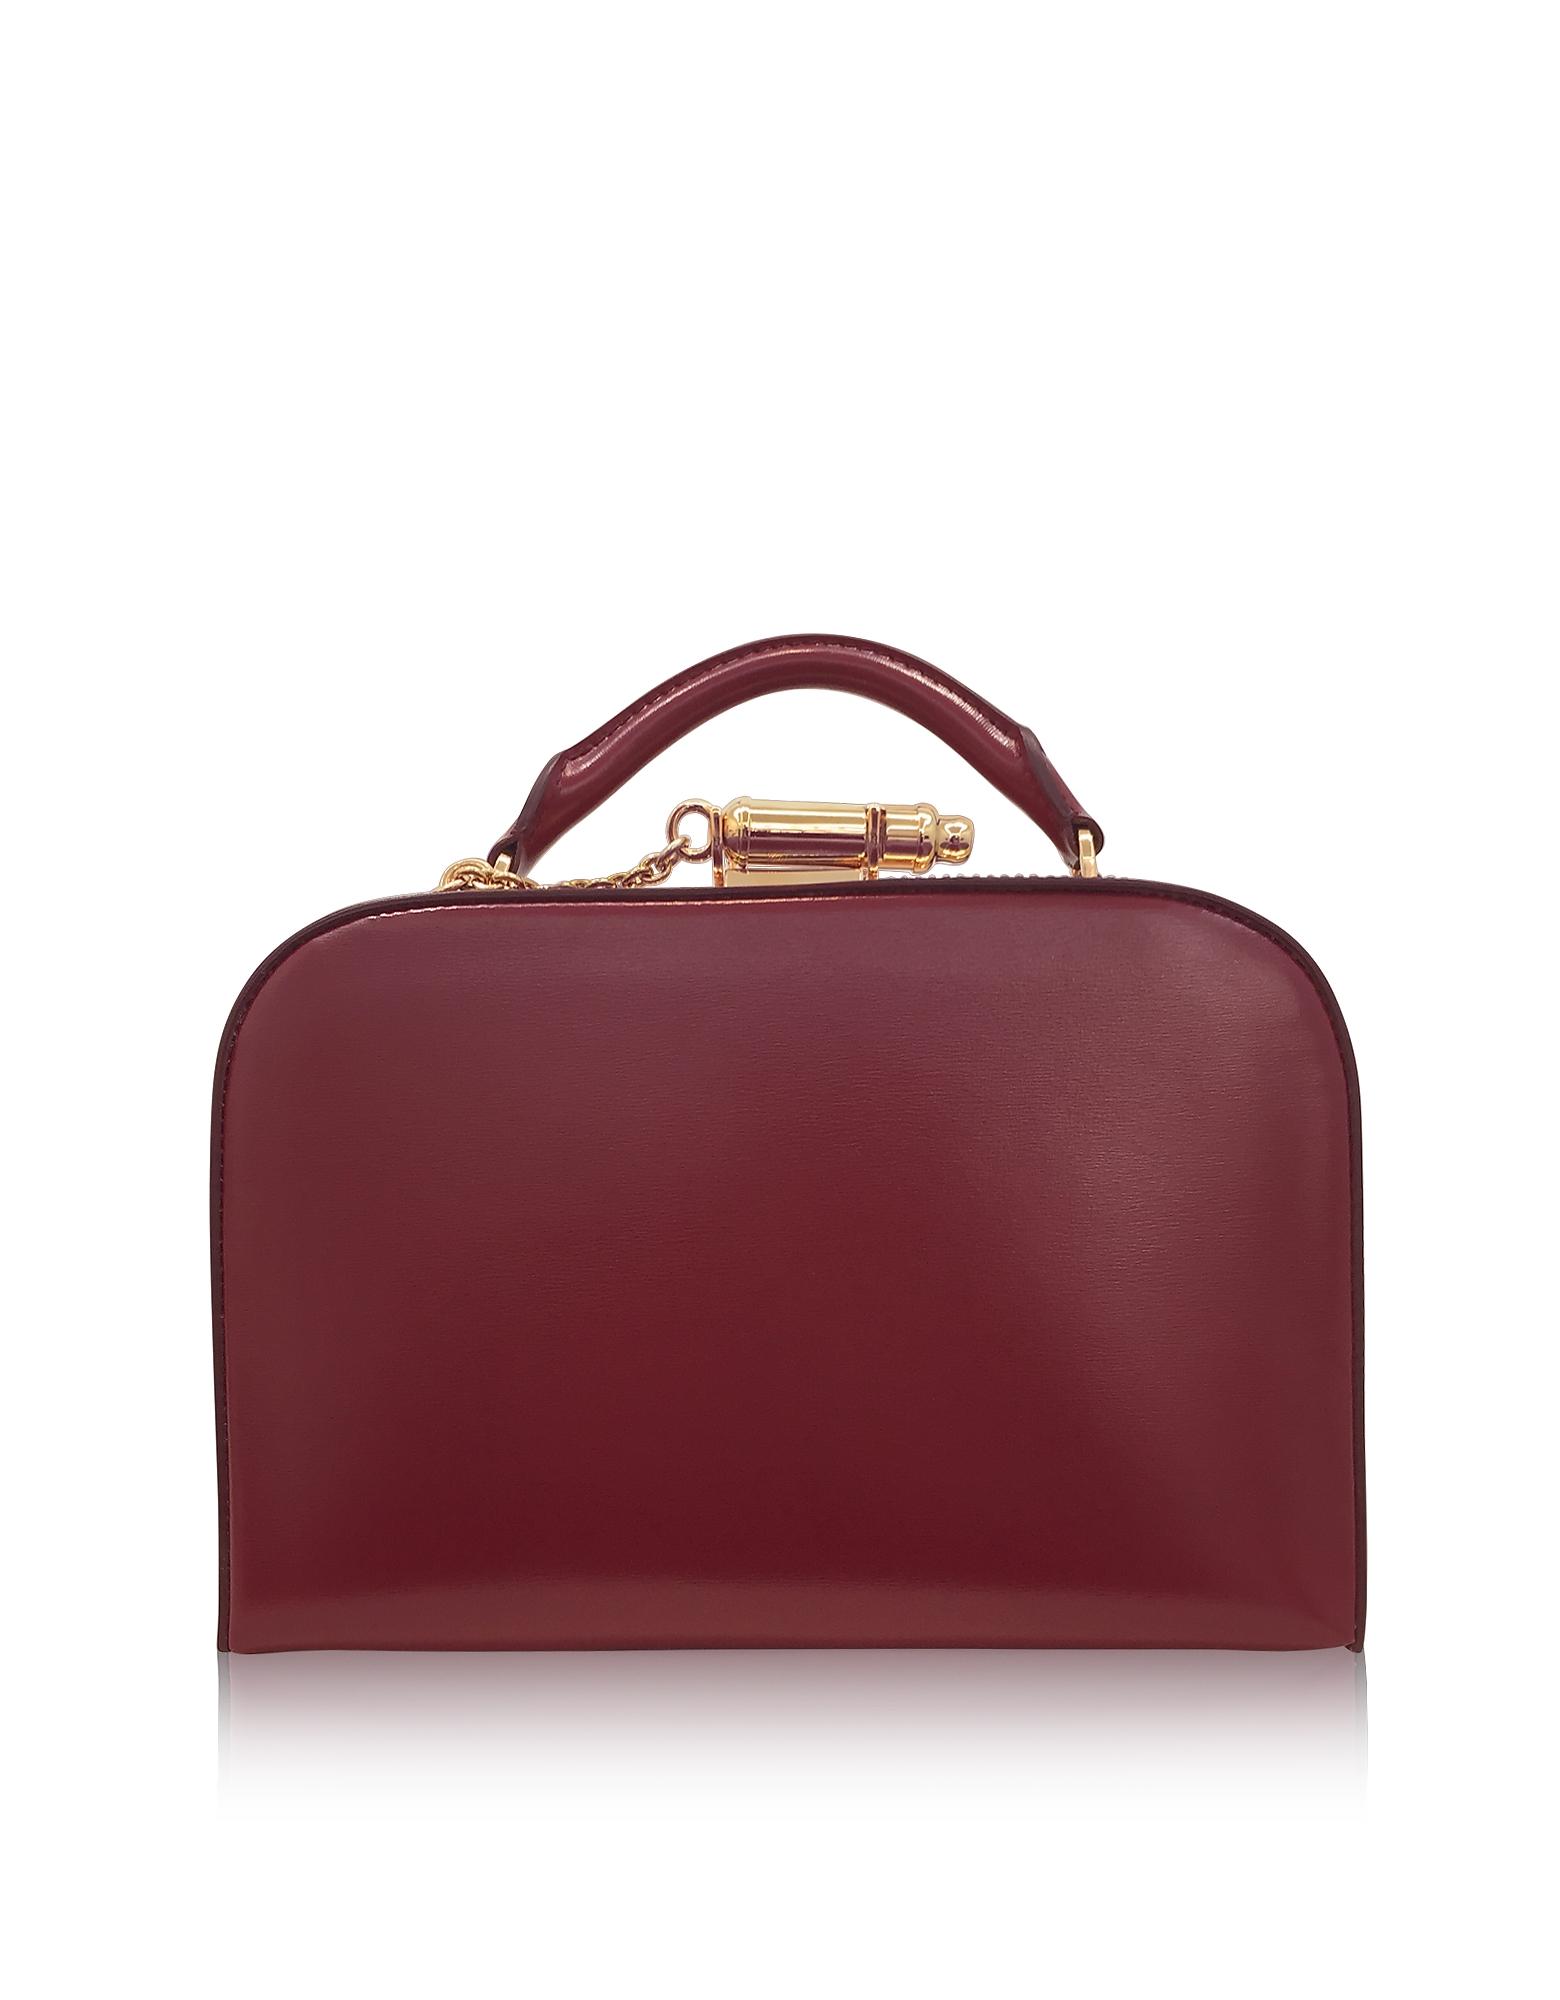 Sophie Hulme Handbags, Dark Red Leather Whistle Case Bag